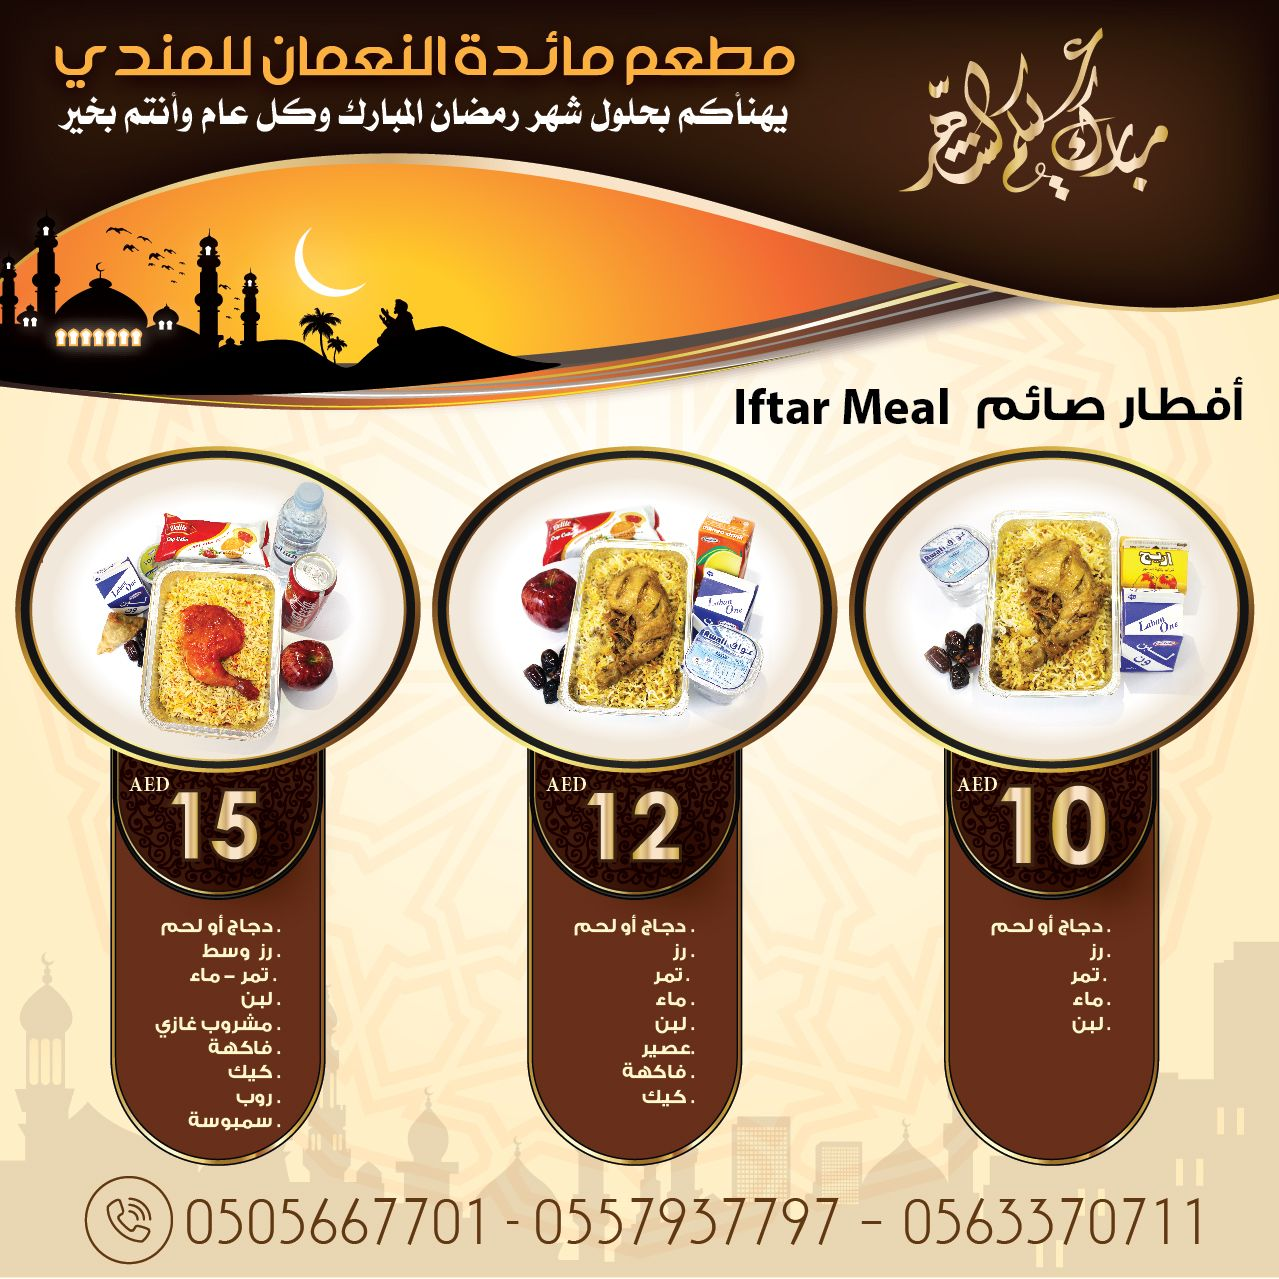 وجبات افطار صائم في رمضان مطعم النعمان دبي و عجمان Meals Ajman Menu